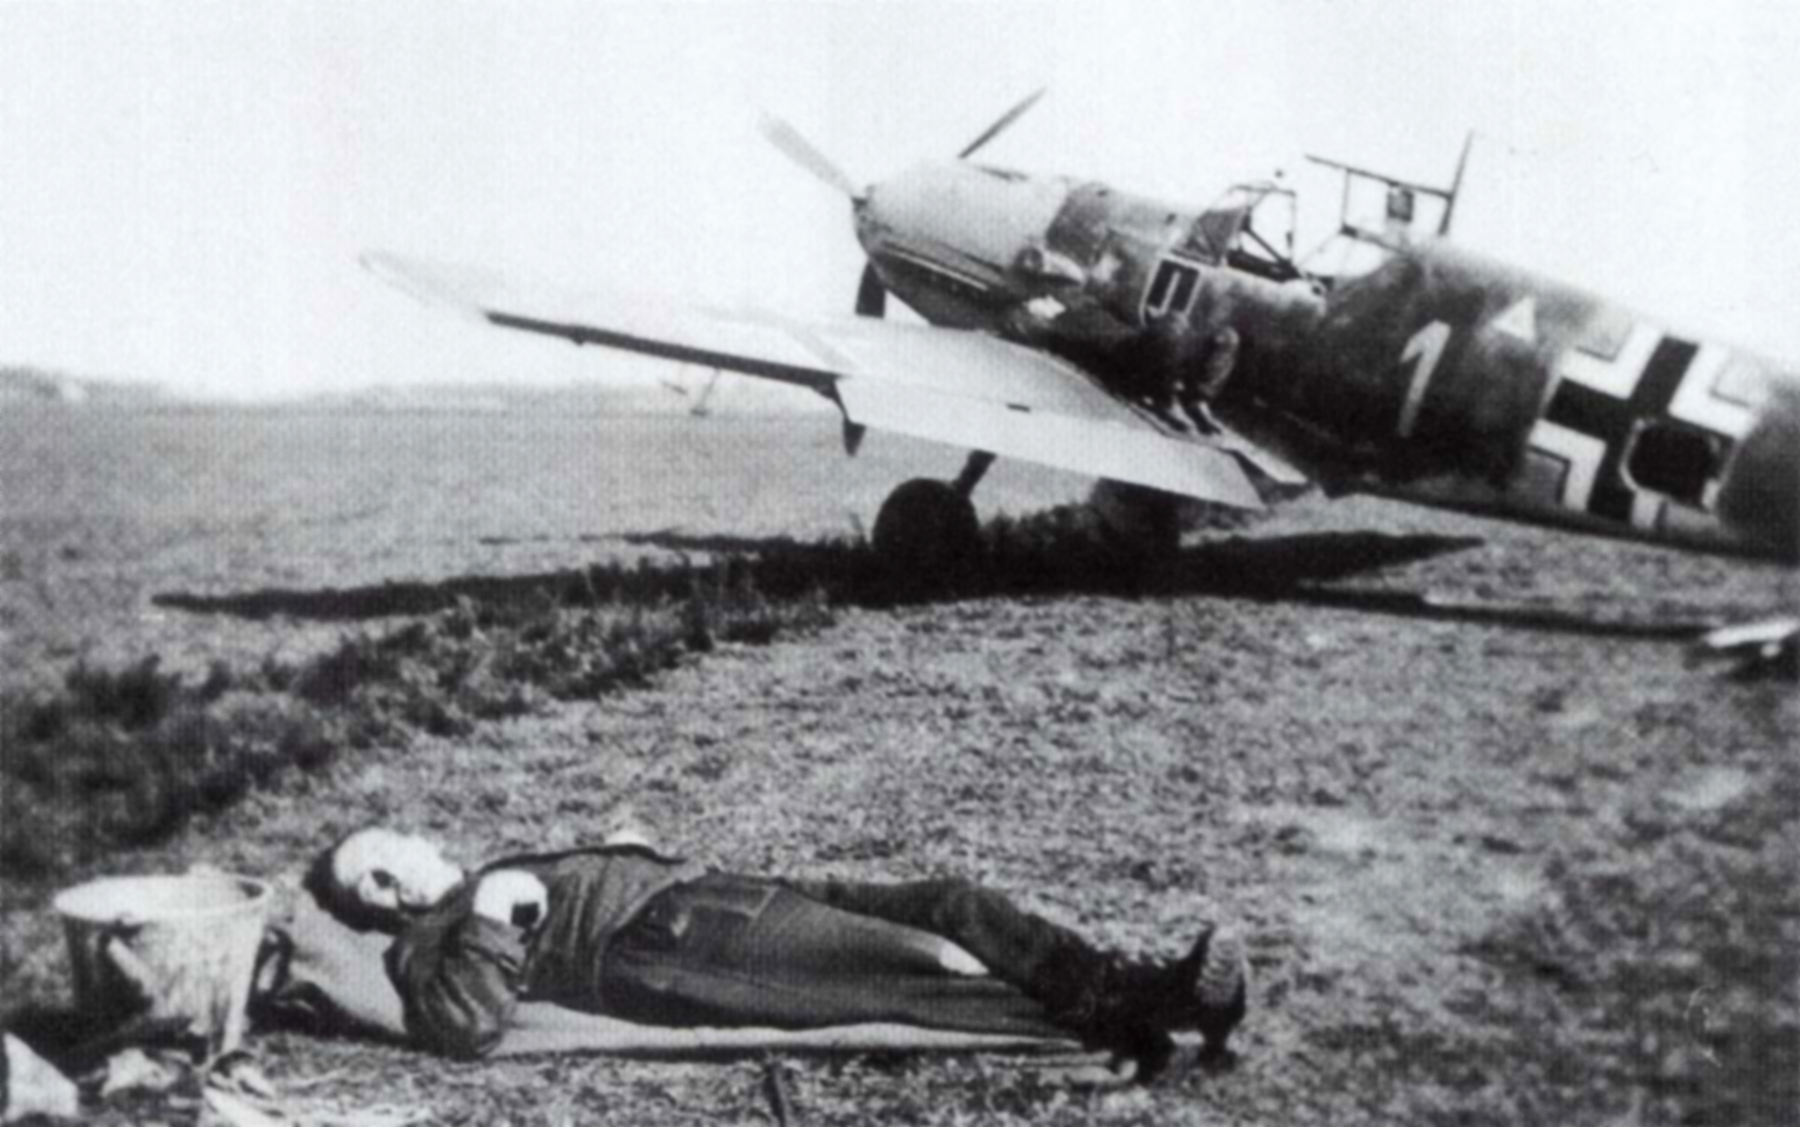 Messerschmitt Bf 109E4 1.JG52 White 1 Johannes Steinhoff Germany 1941 01